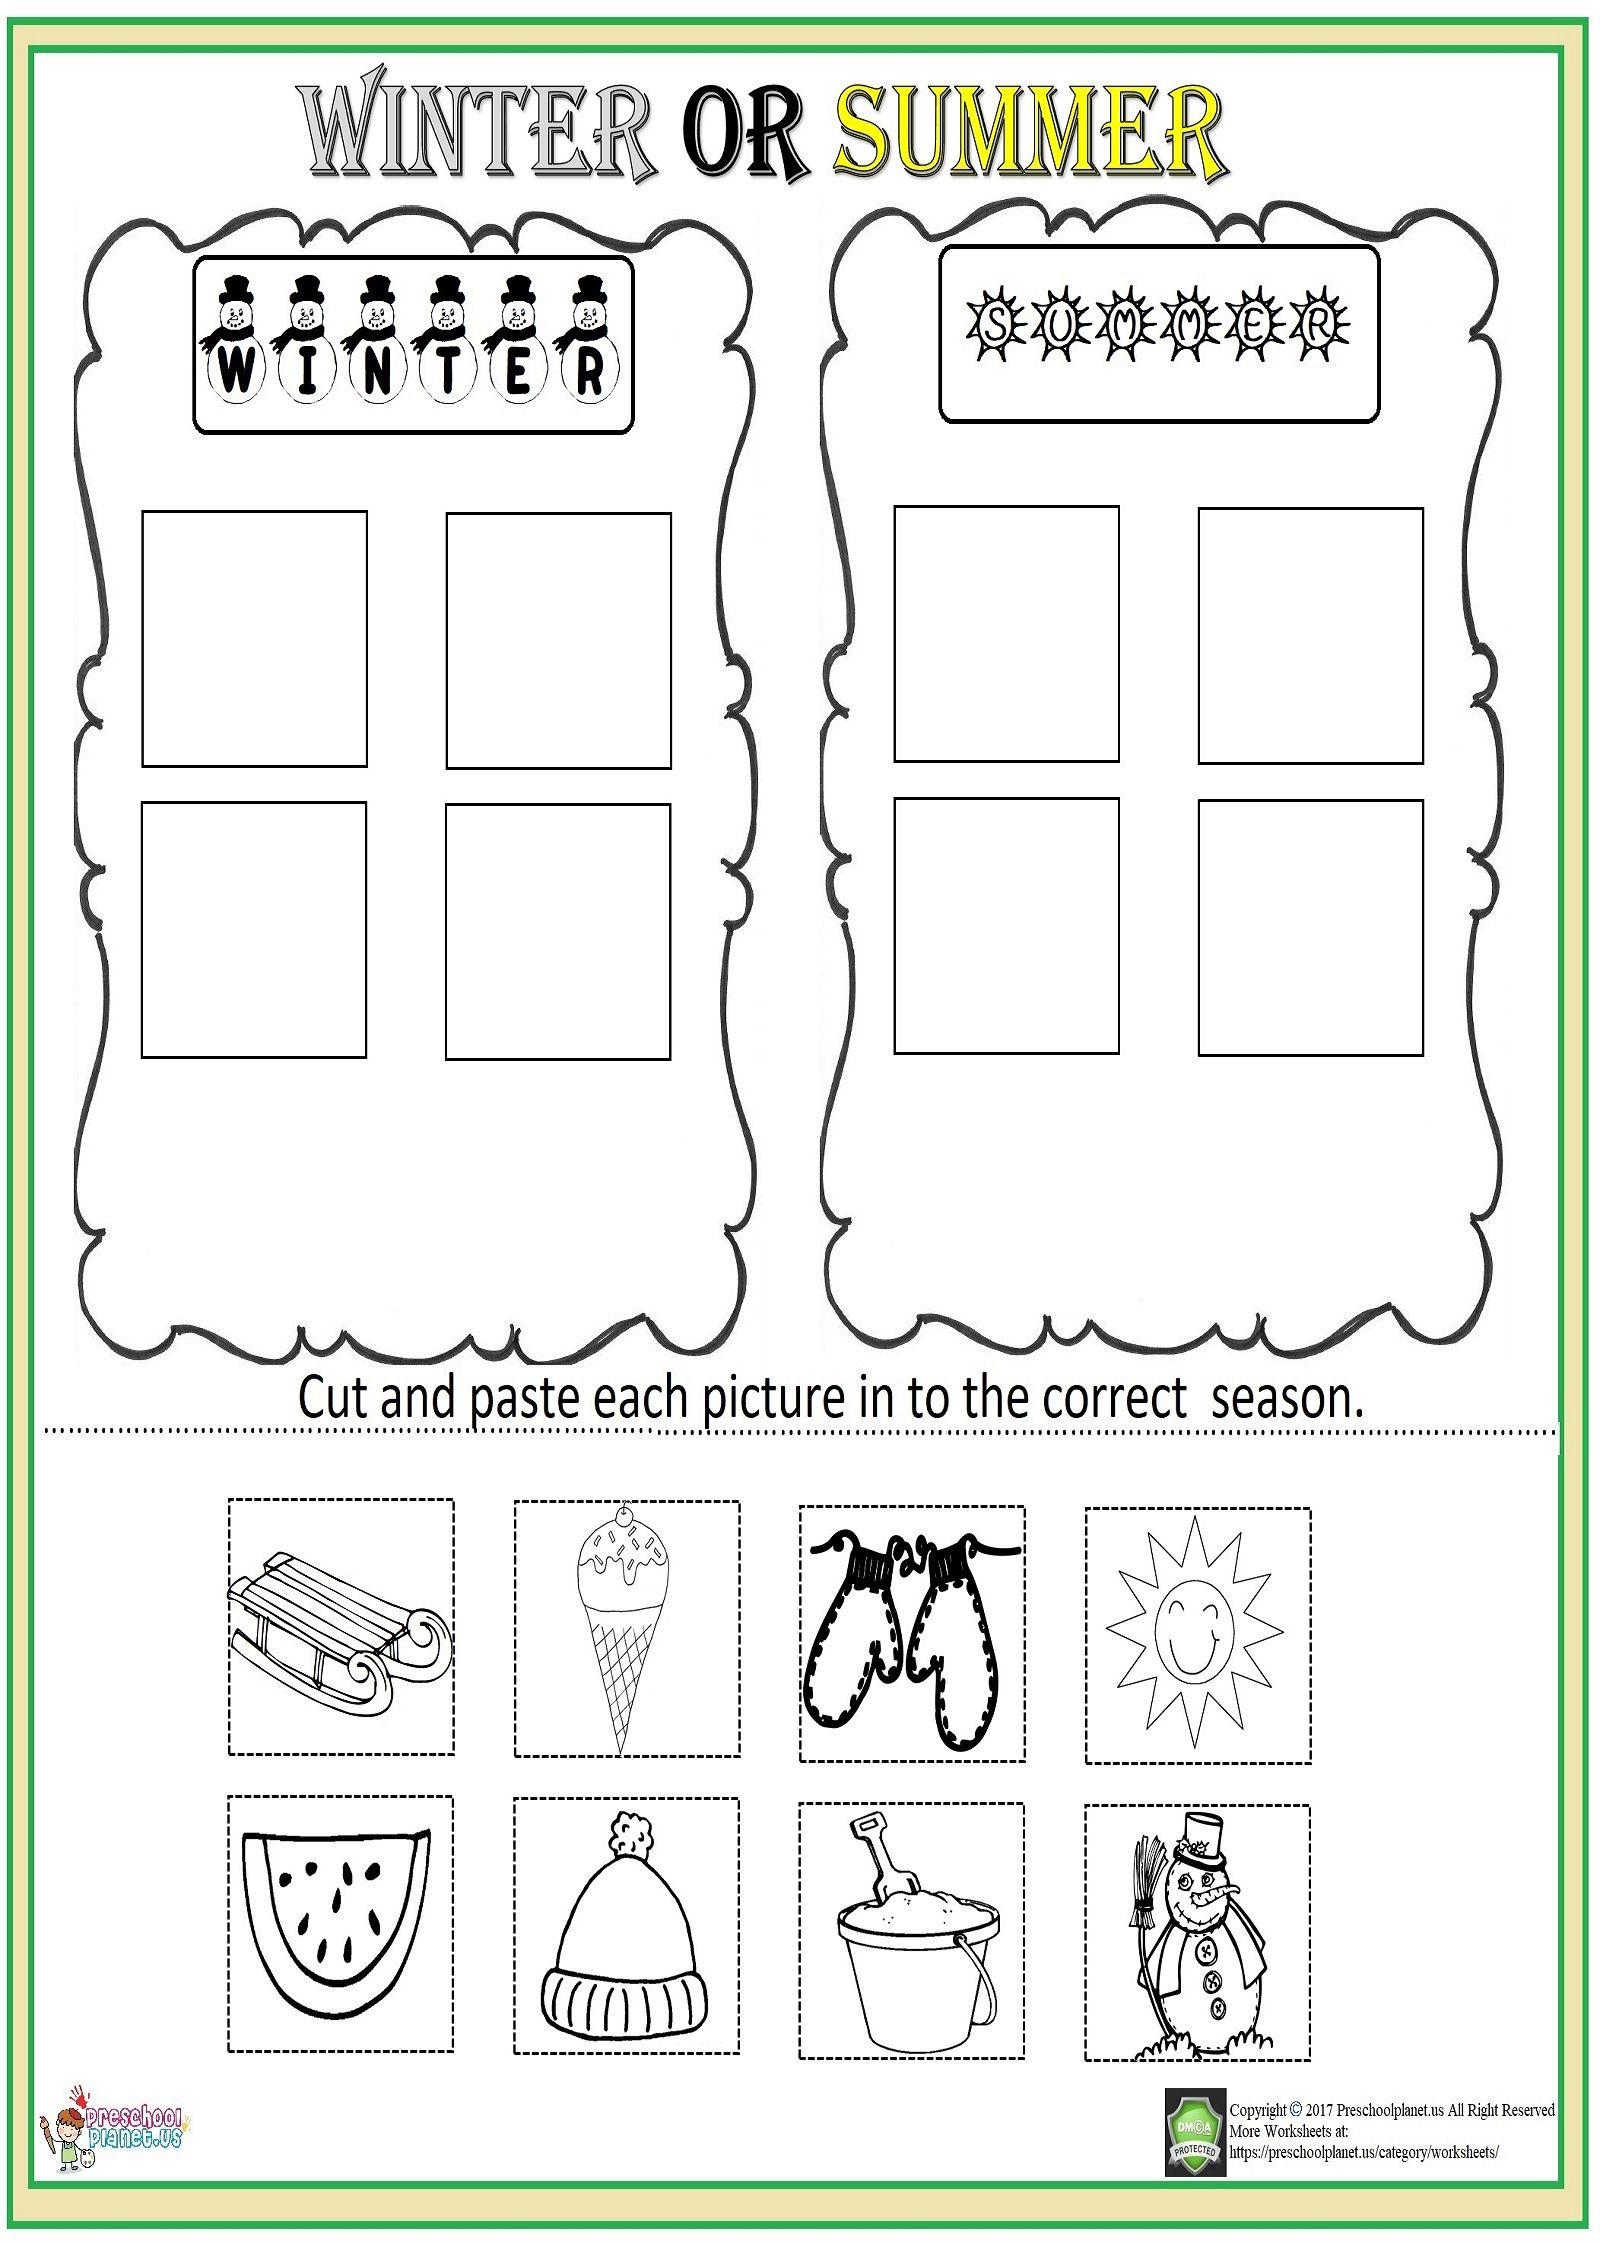 Pin on Worksheet for kids